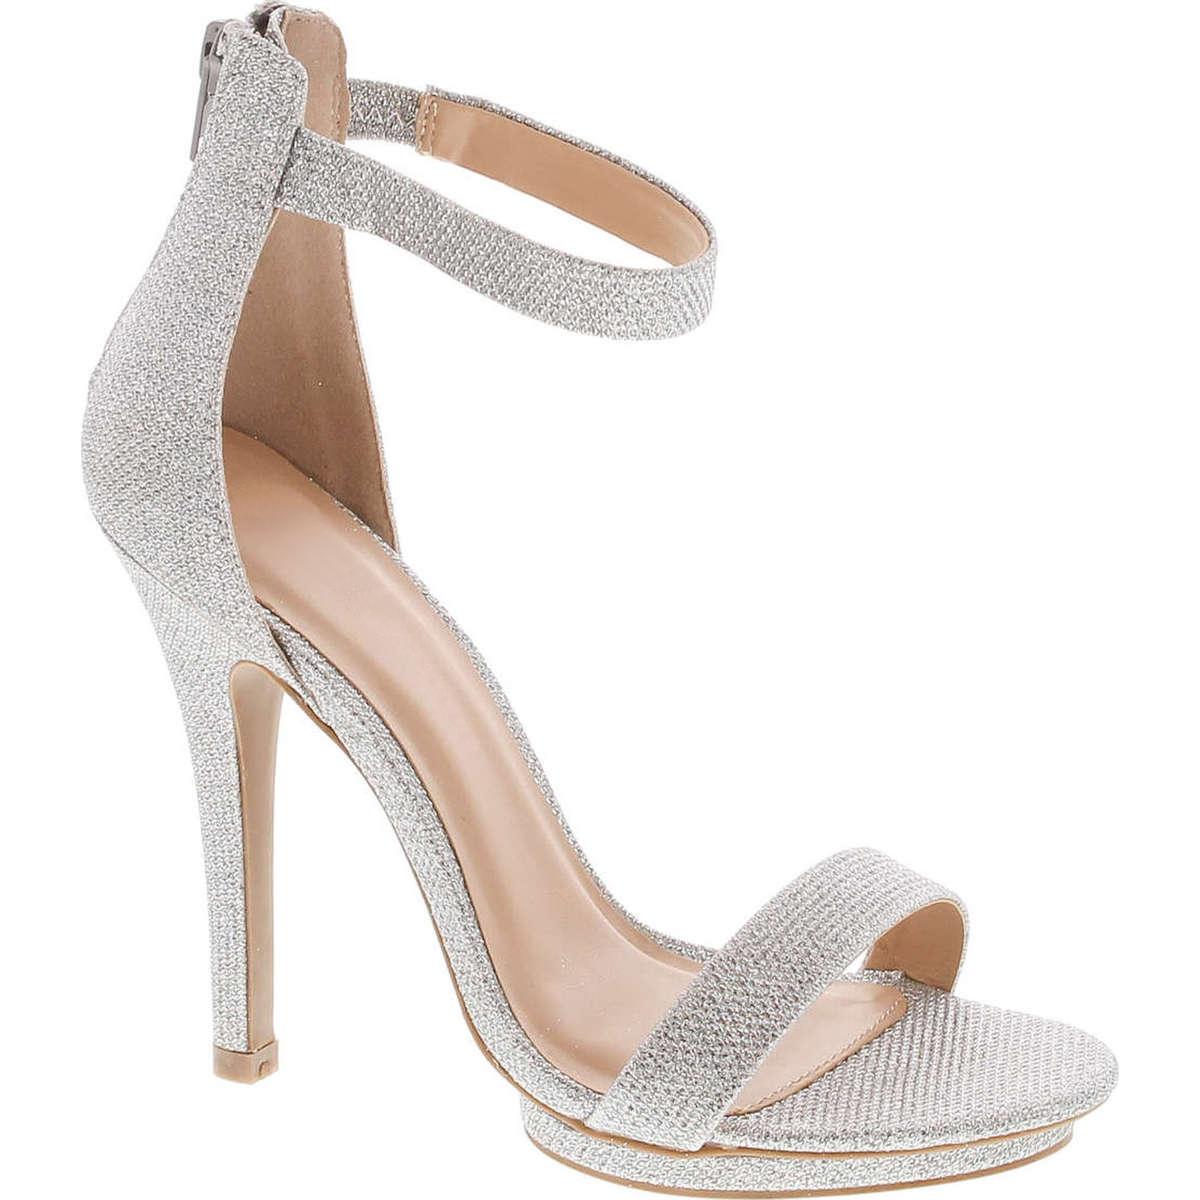 762399de03fa Static Footwear Womens Open Toe Ankle Strap High Stiletto Heel Platform  Pump Sandal - ShoeCenter.com